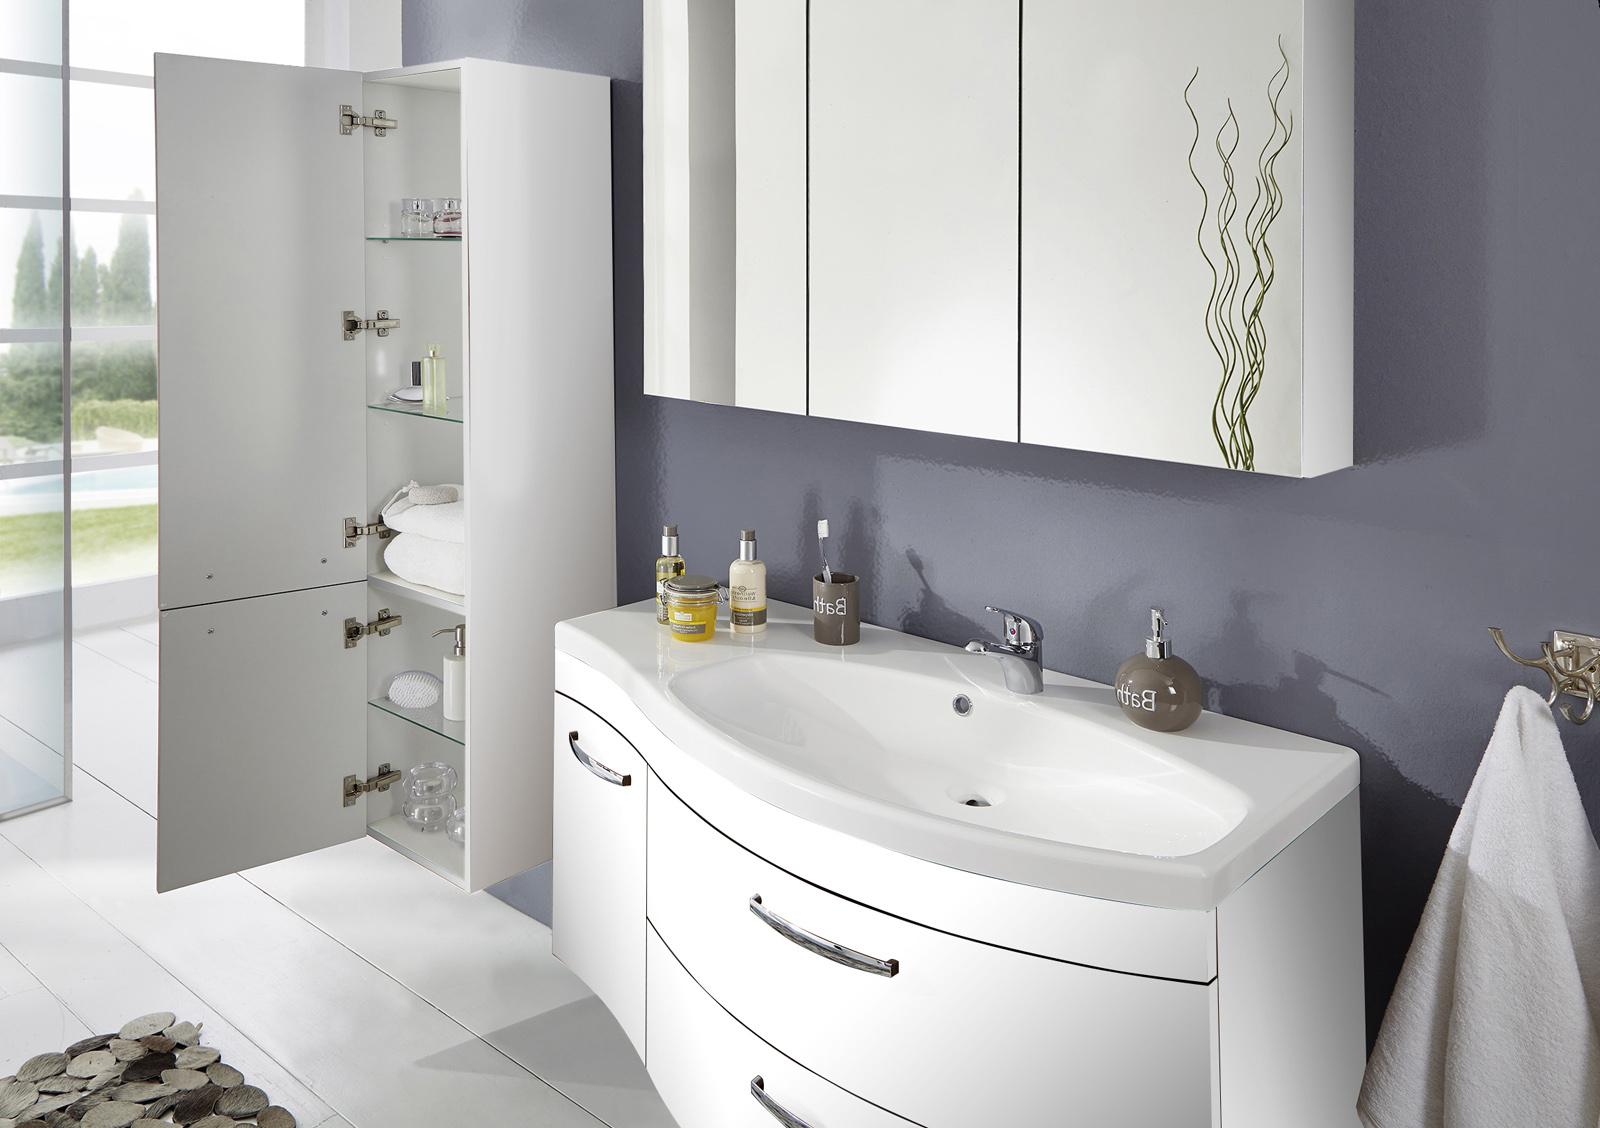 sam badm bel matt wei 3tlg spiegelauswahl vena rechts. Black Bedroom Furniture Sets. Home Design Ideas